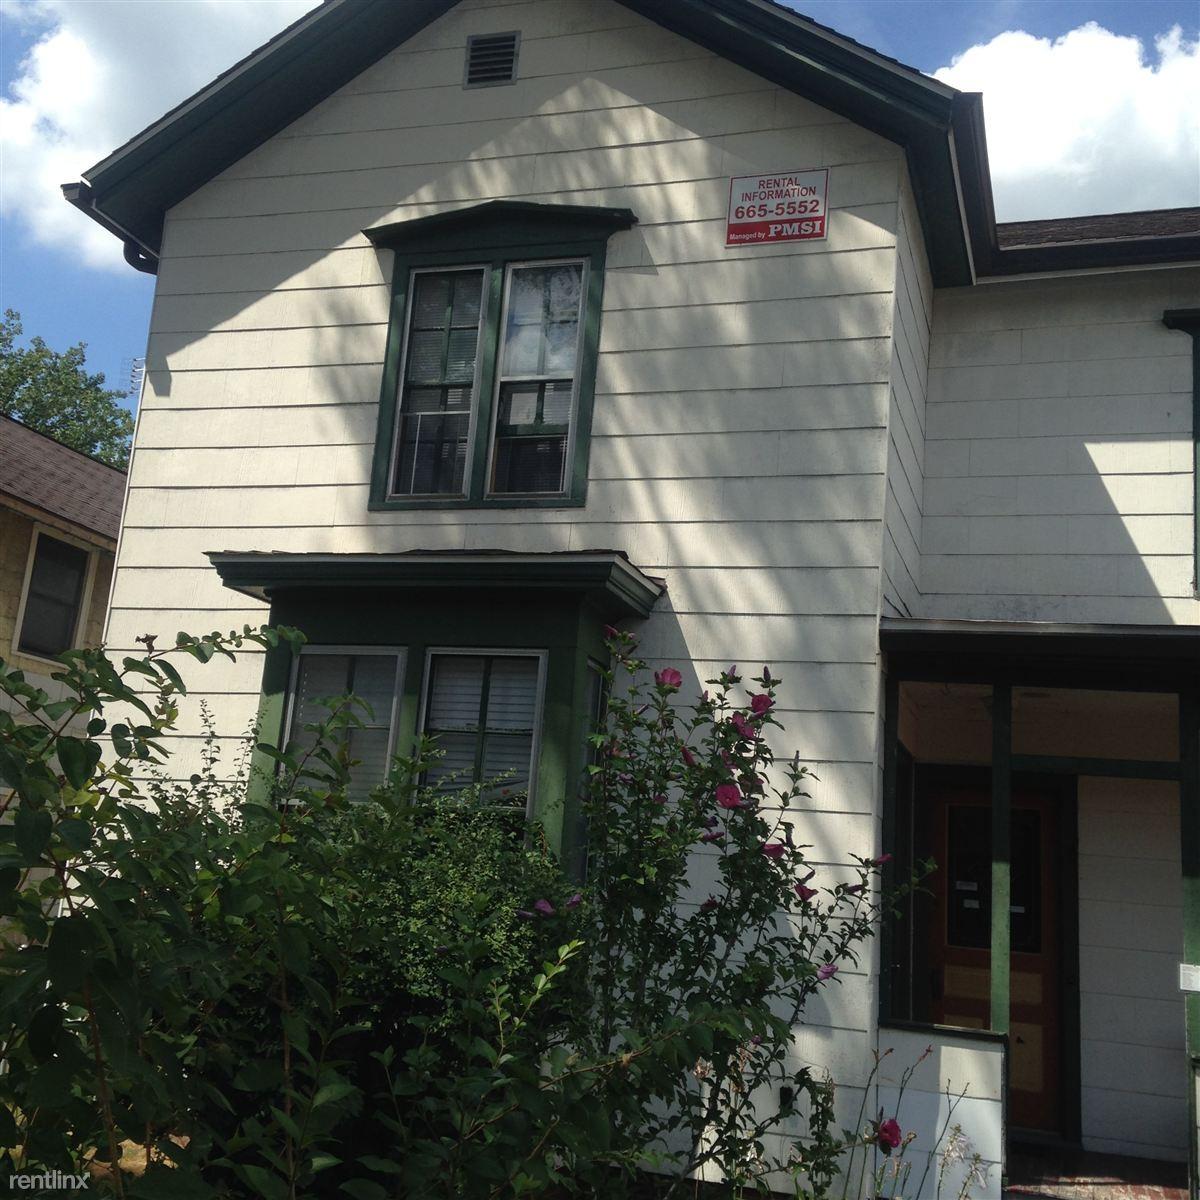 Glen Haven Apartments: 533 Elizabeth St Apartments For Rent In Ann Arbor, MI